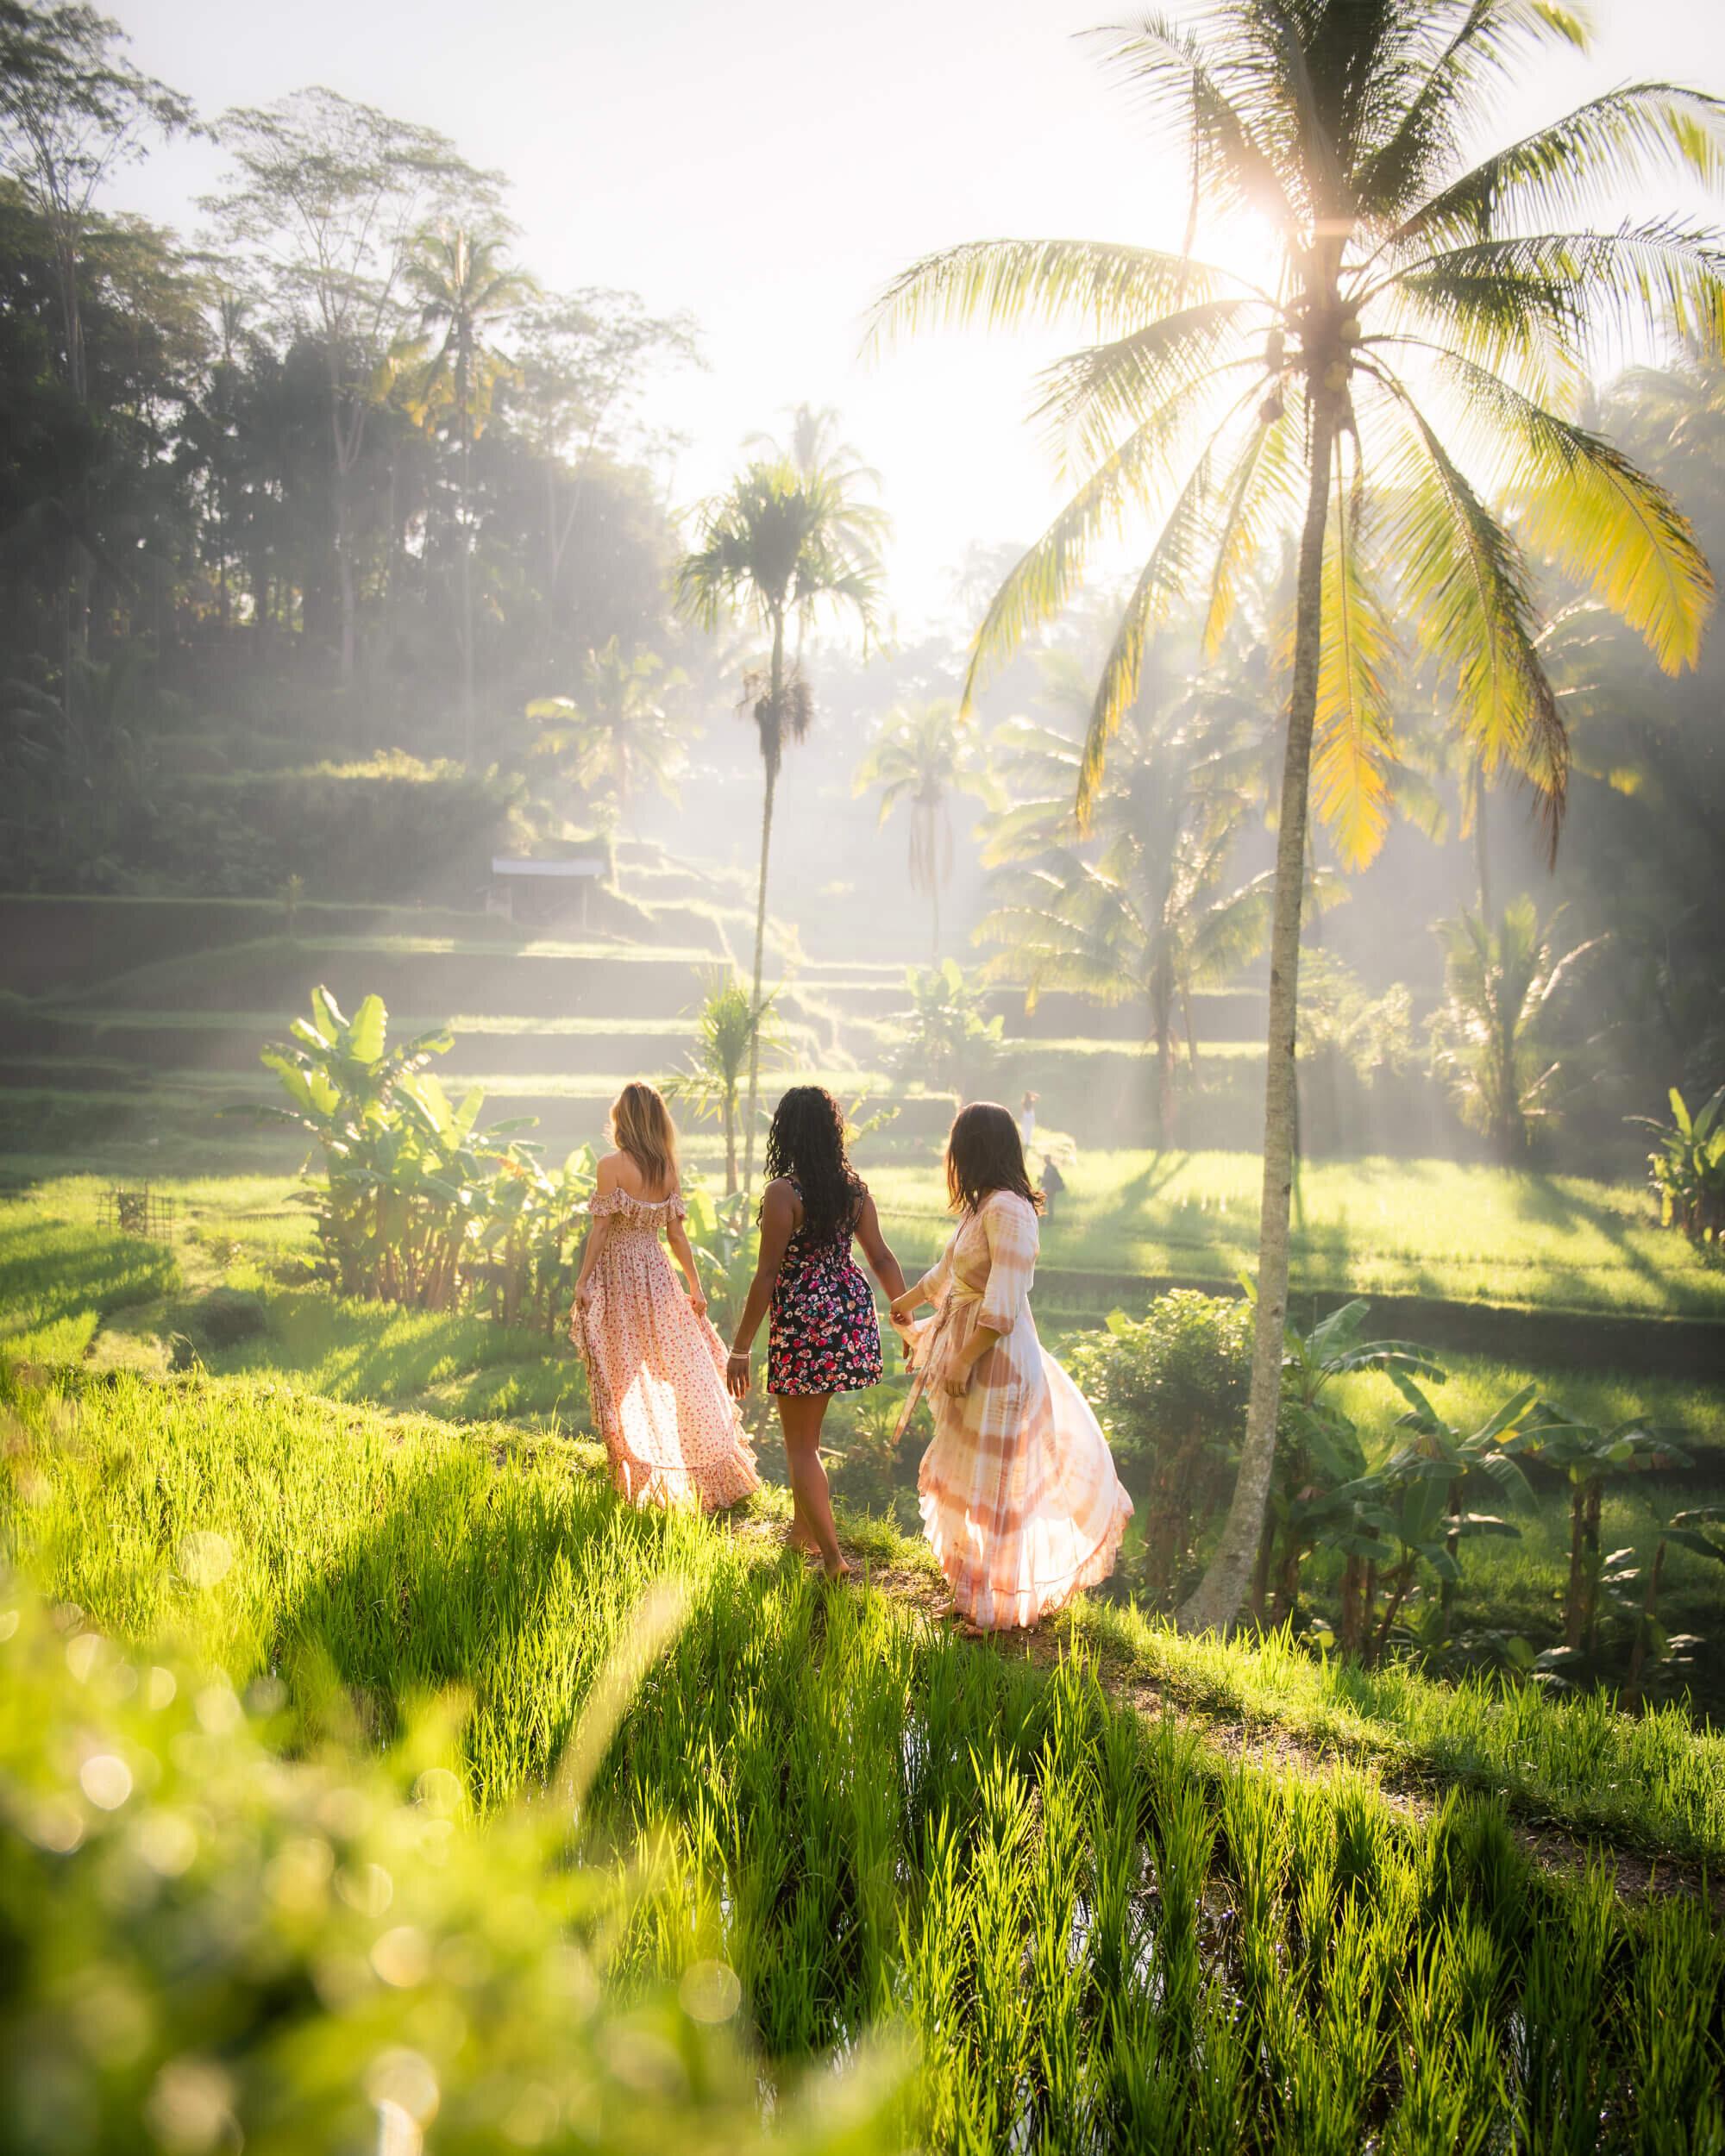 Rice Terraces in Bali. Photo by:  Jess Bonde